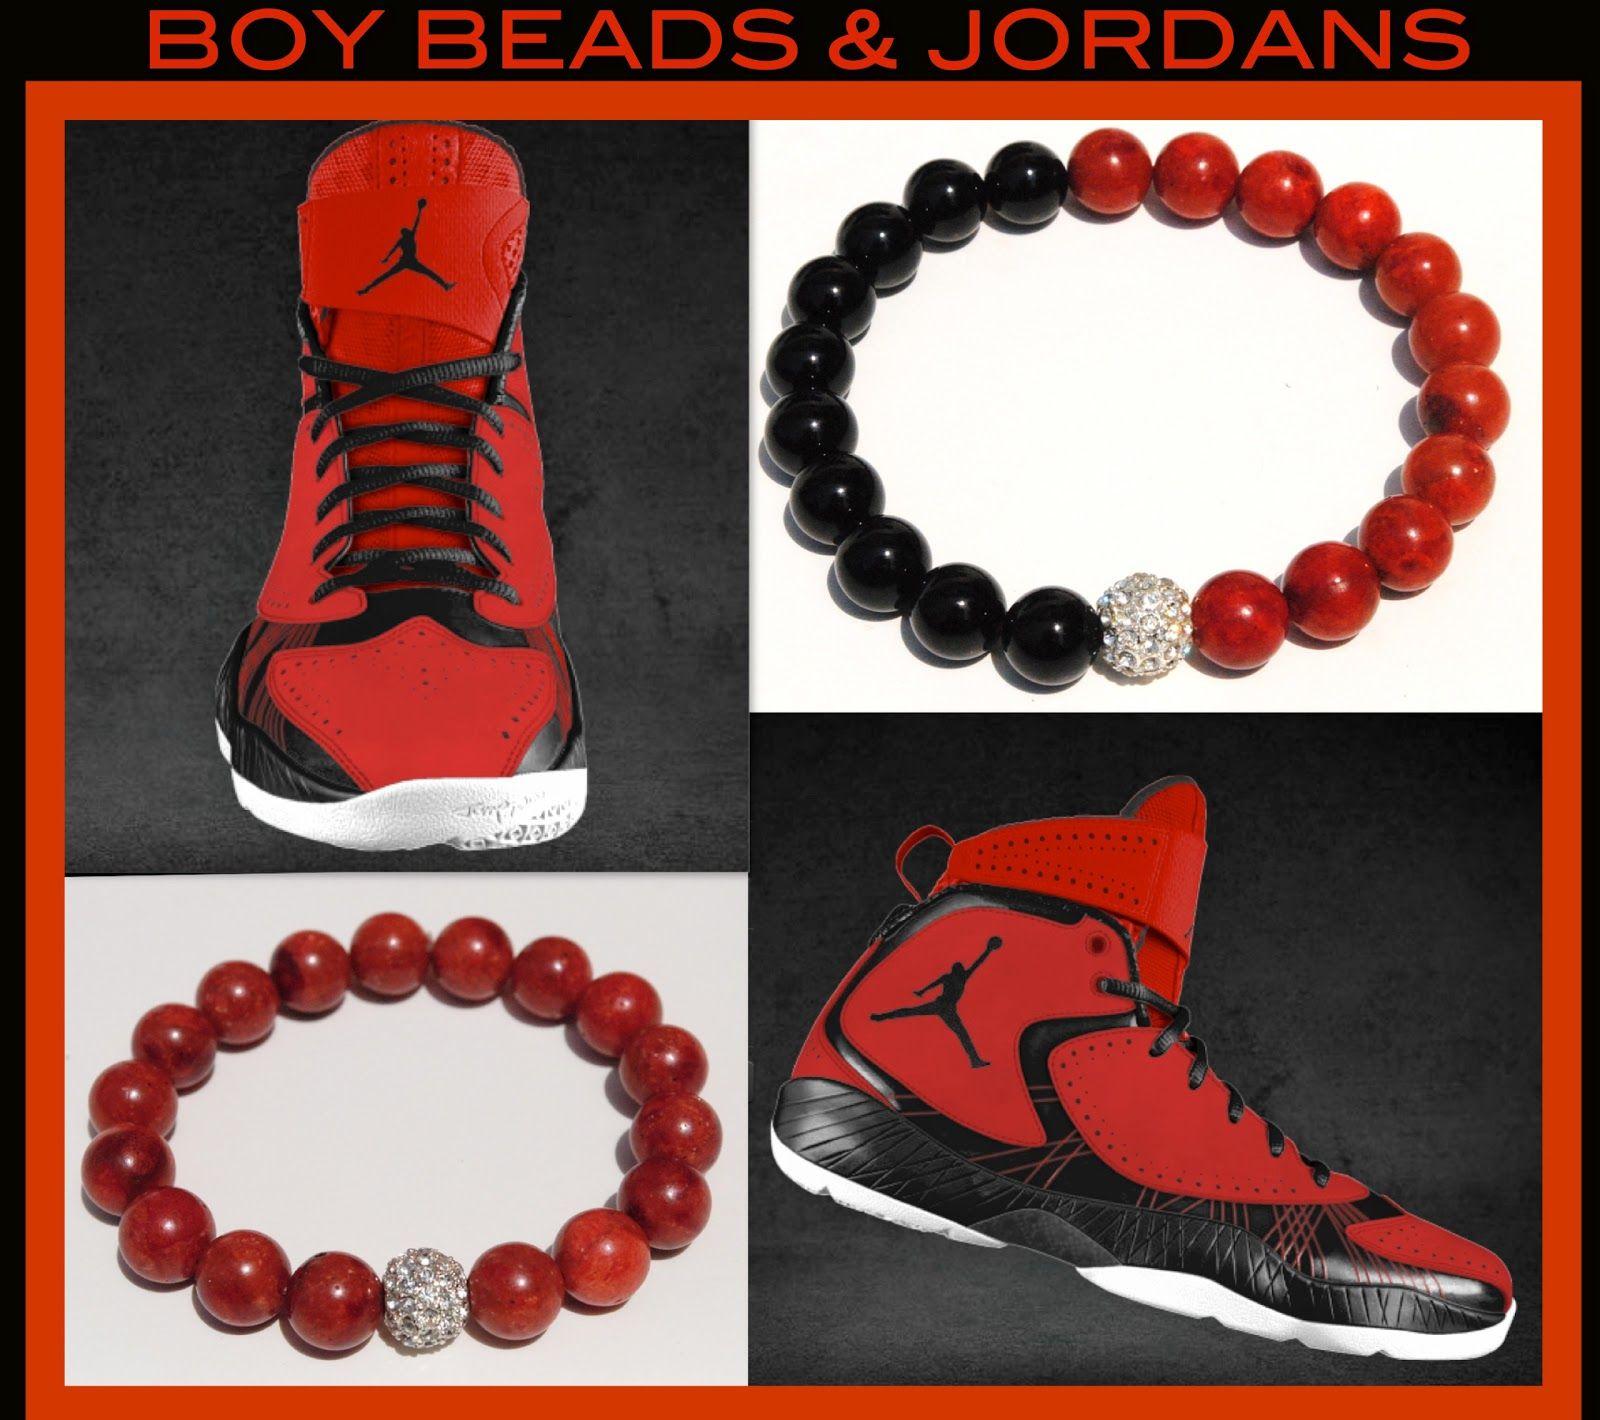 BOYBEADS+AND+JORDANS+WORKOUD+RED+BLACK+CORAL+ONYX+SNEAKERS+BASKETBALL+MICHAEL+JORDAN+CUSTOM+SNEAKERS+JORDANS+MENS+FASHION.jpg (1600×1420)